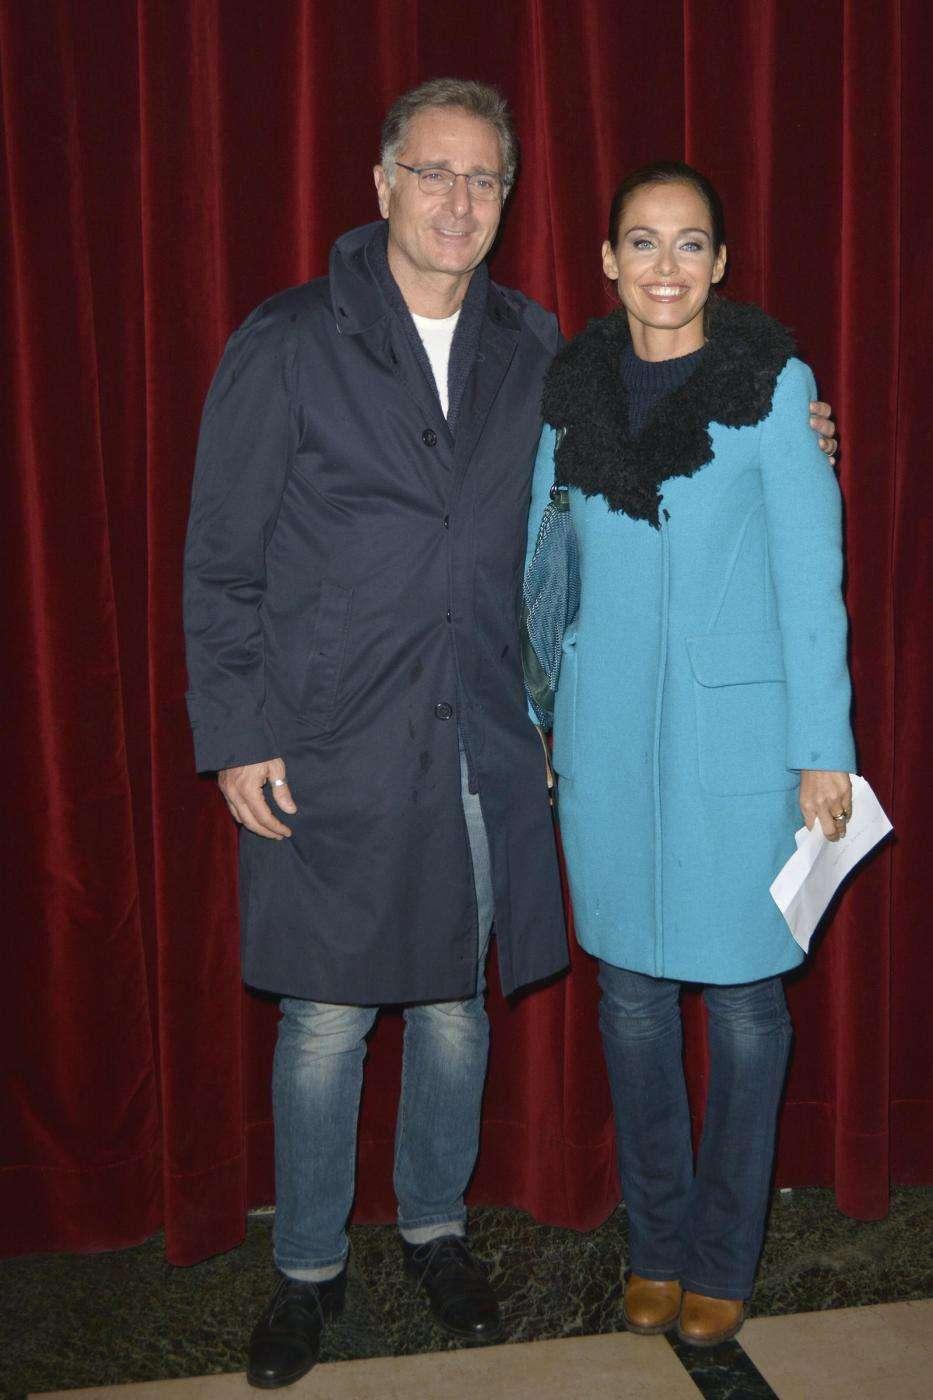 Sonia Bruganelli e Paolo Bonolis insieme